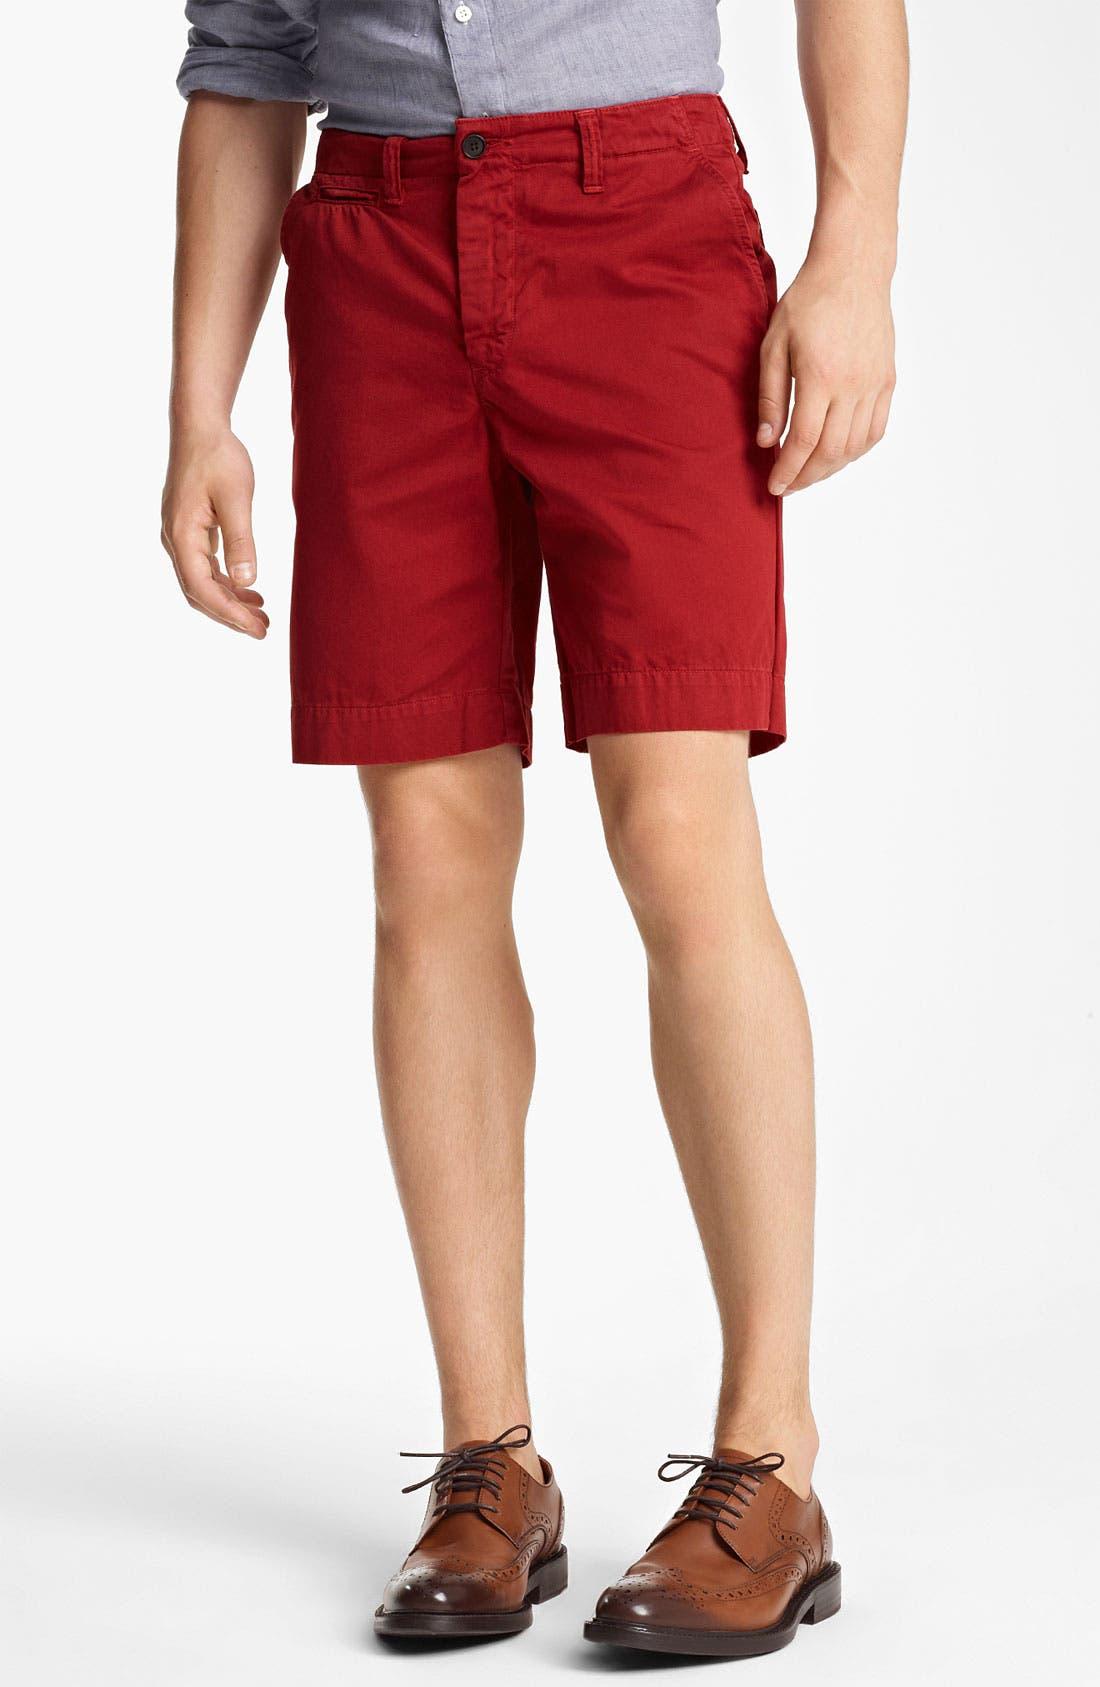 Alternate Image 1 Selected - Billy Reid 'Boman' Shorts